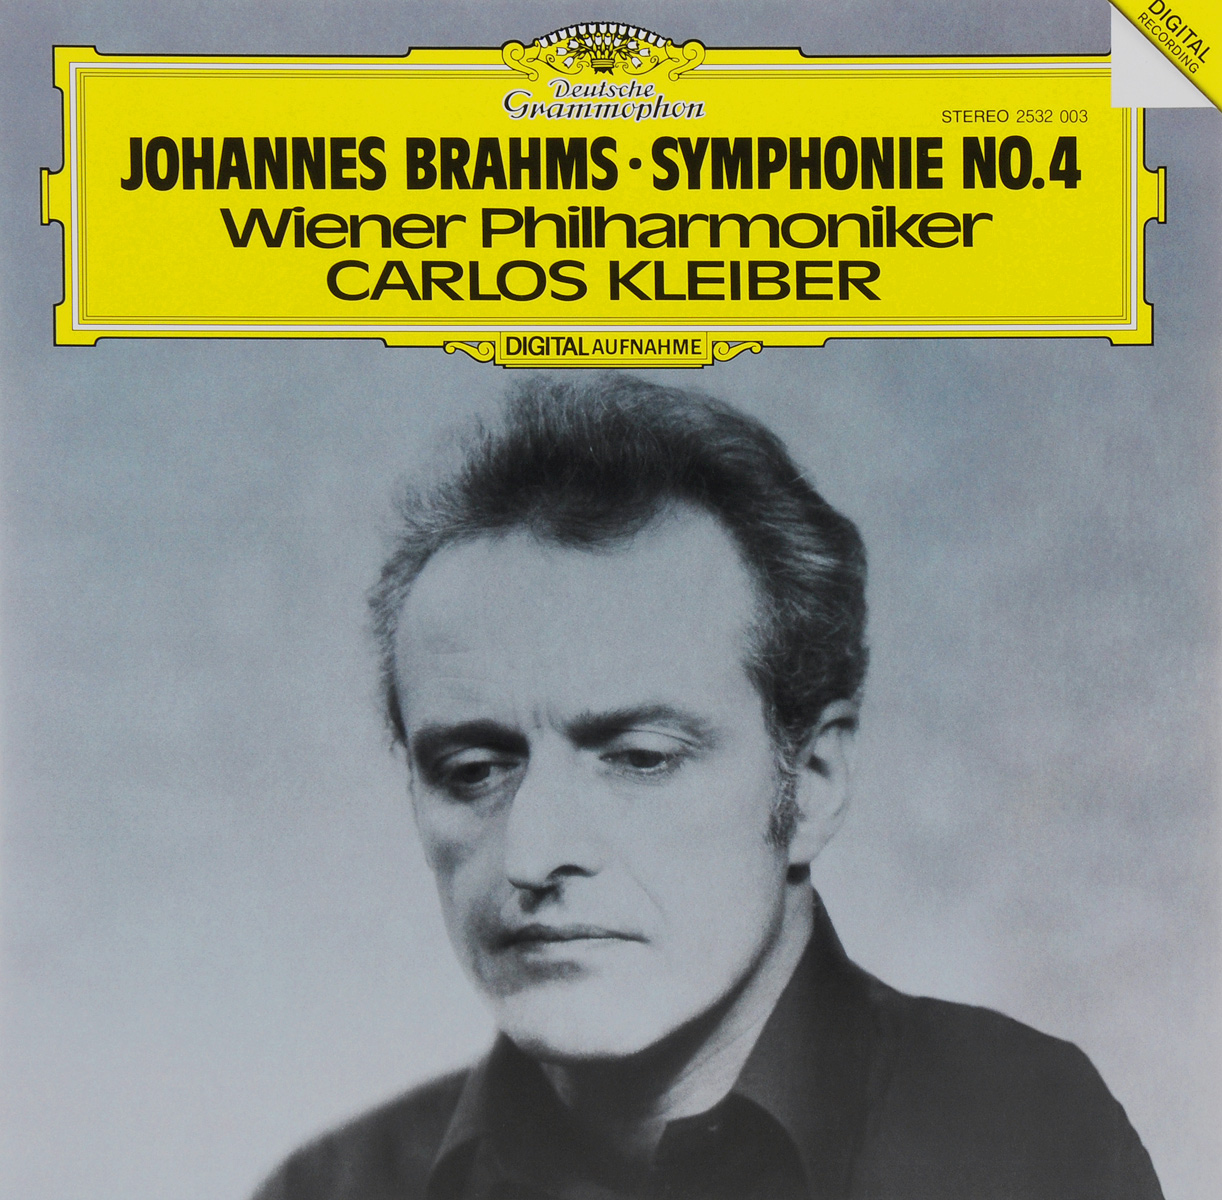 Карлос Кляйбер,Wiener Philharmoniker Carlos Kleiber. Johannes Brahms. Symphonie No. 4 (LP) carlos kleiber carlos kleiber complete orchestral recordings 4 lp box